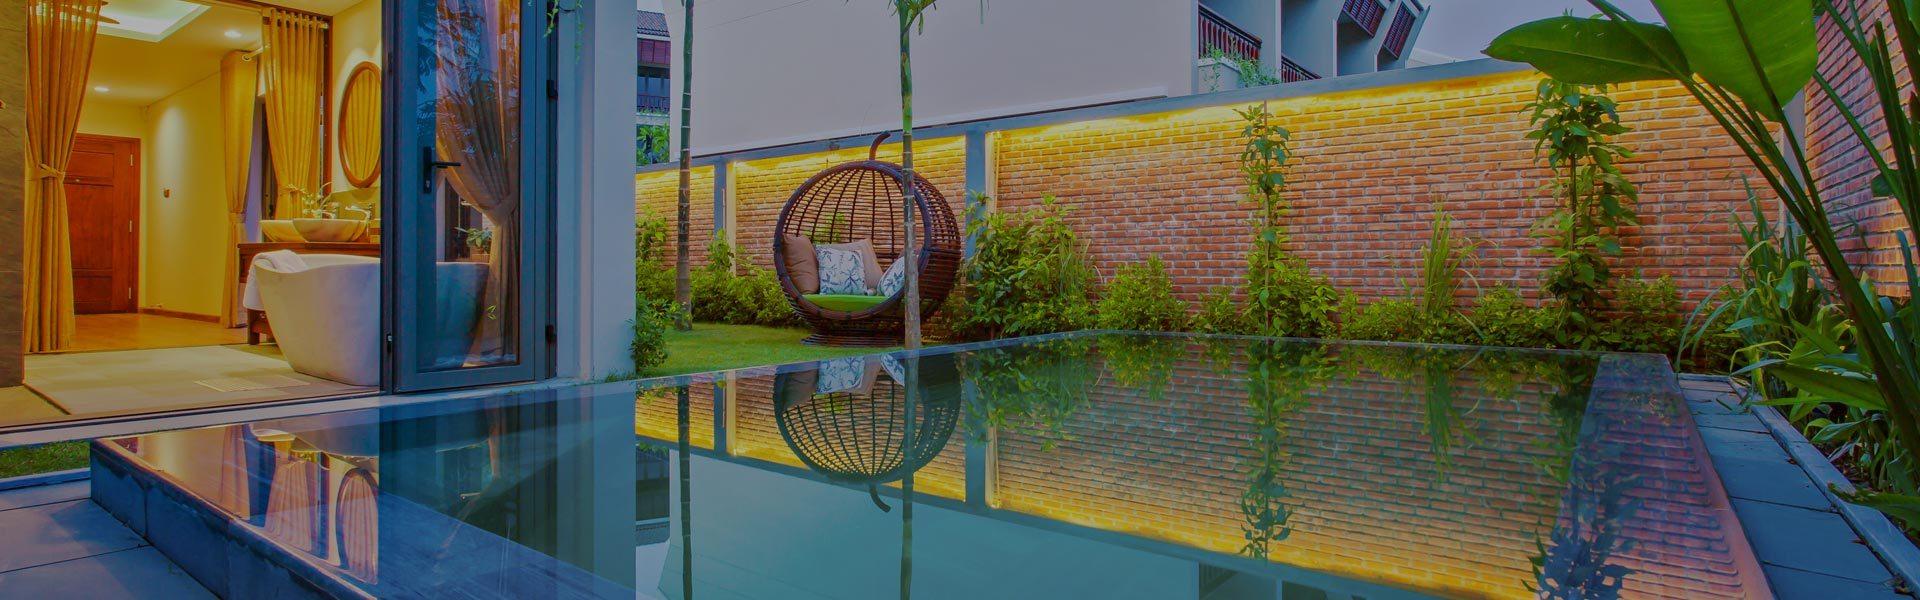 Silk Sense resort destination accommodation